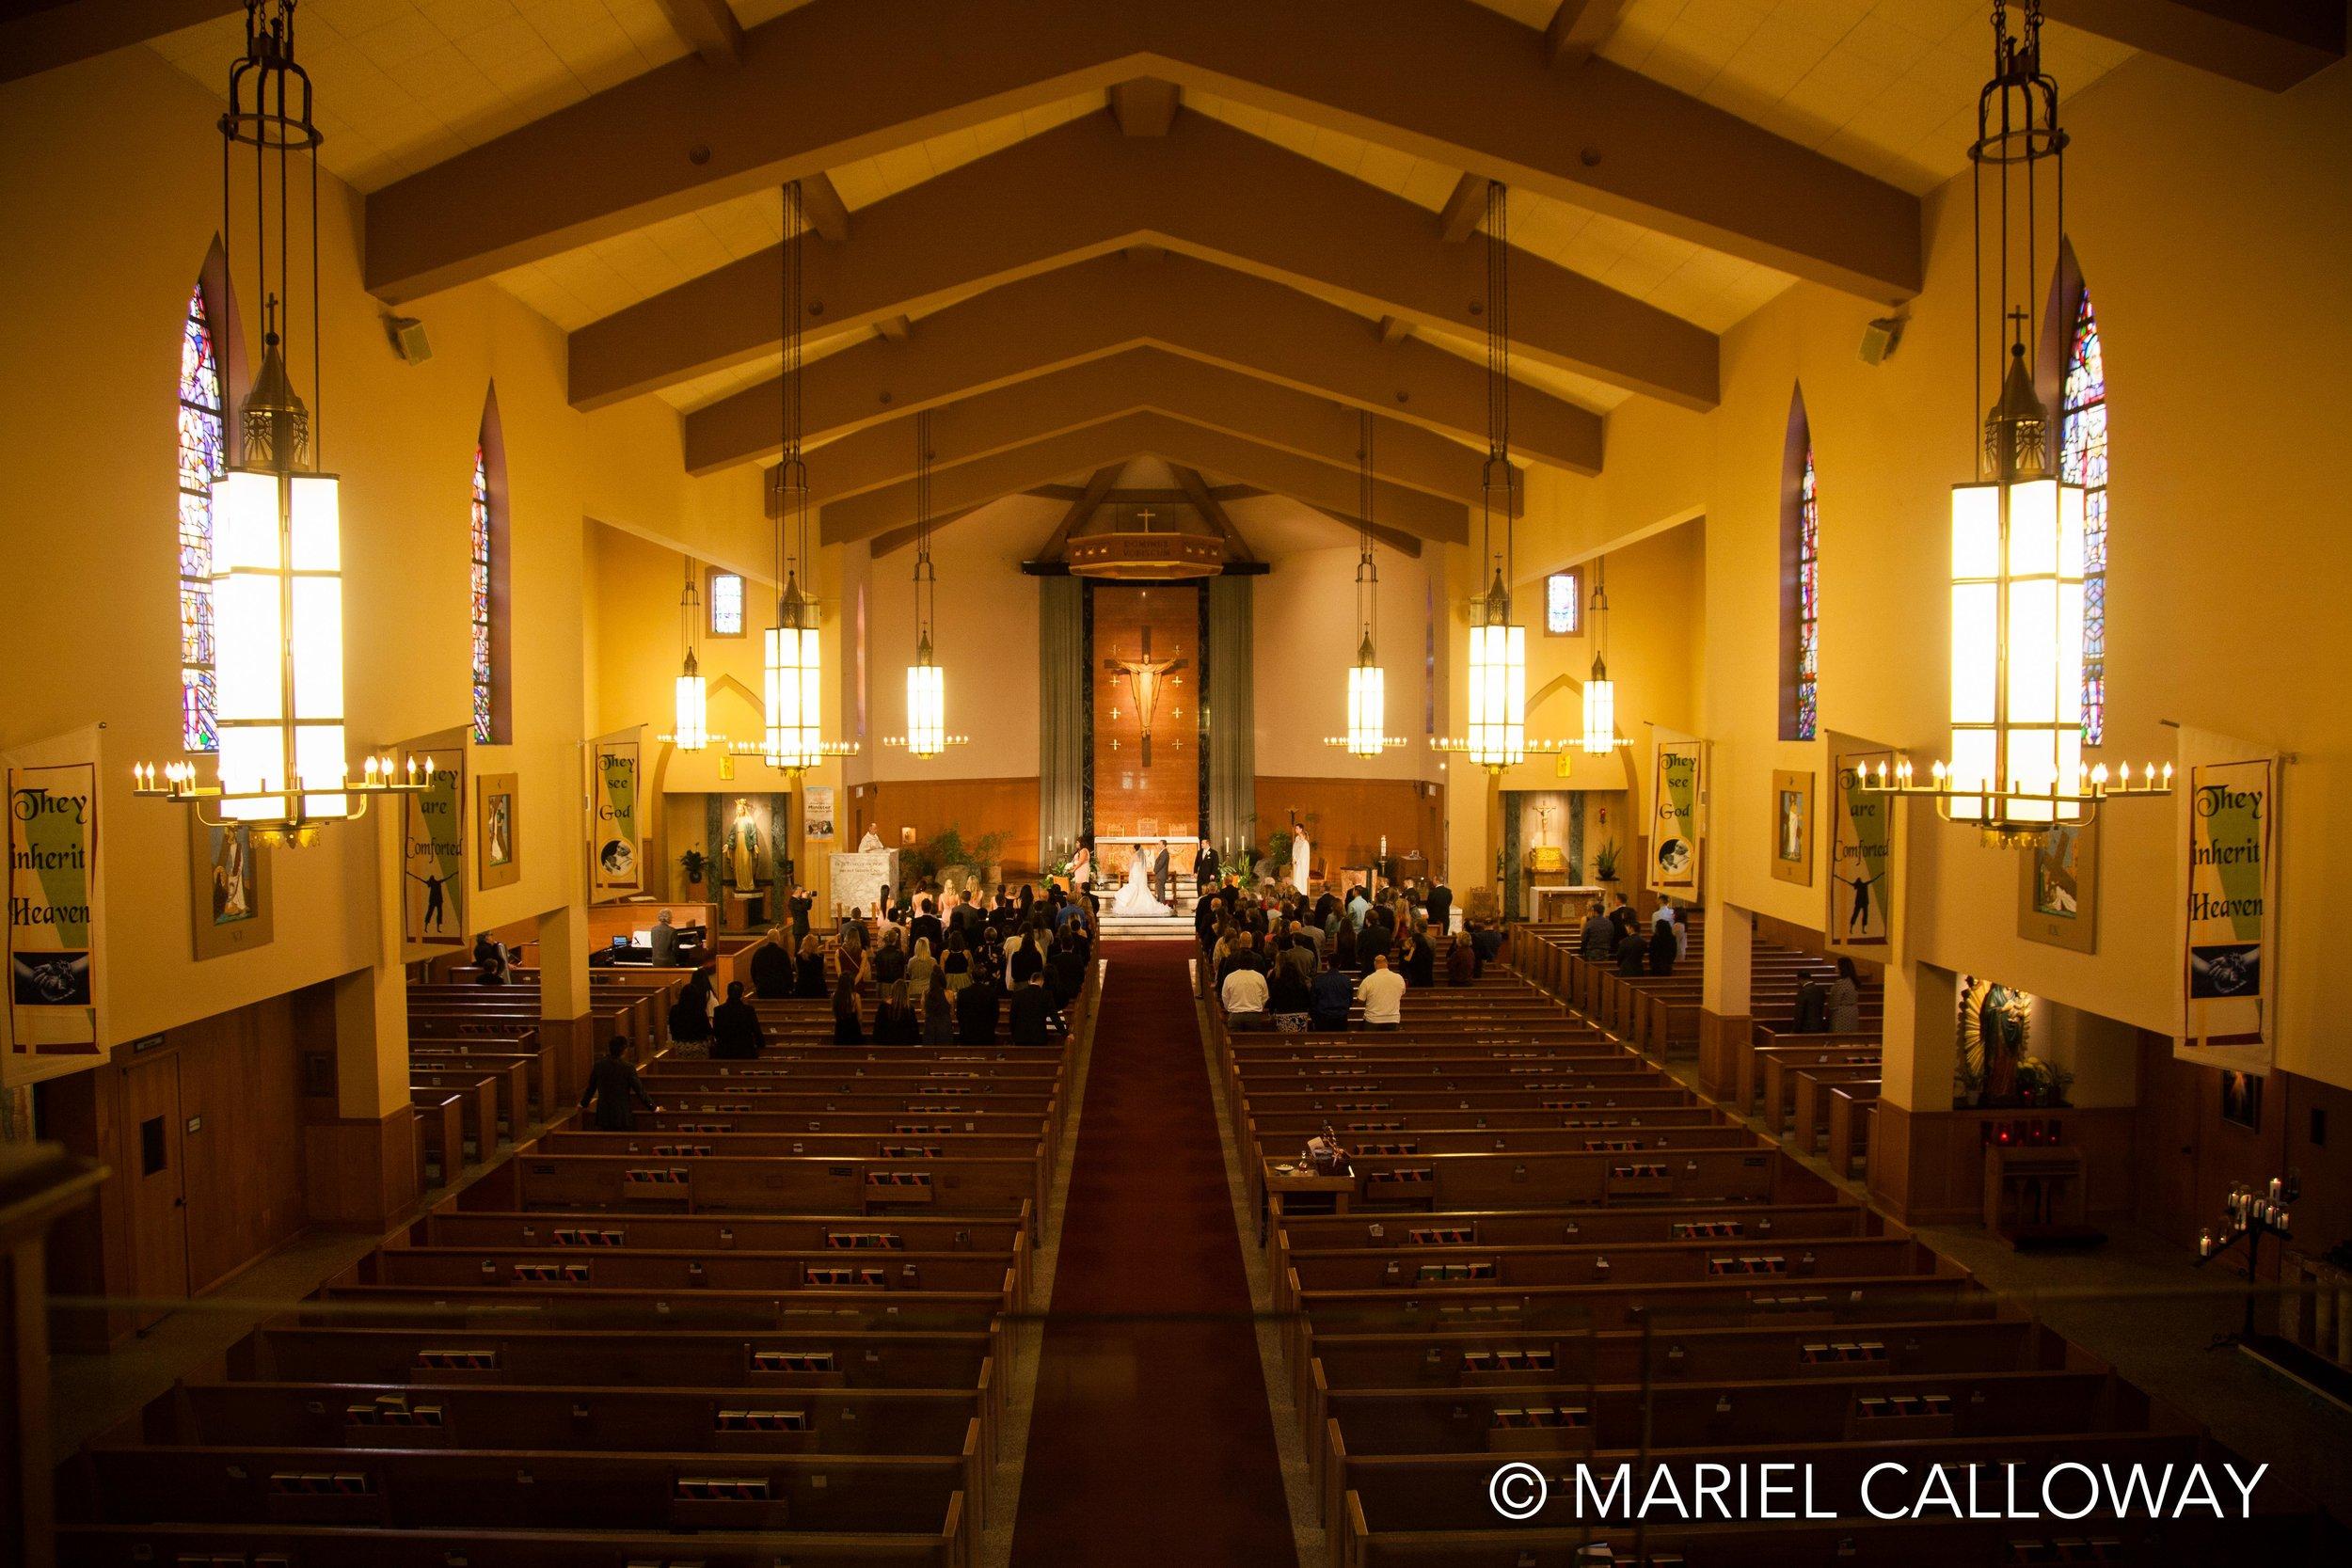 Mariel-Calloway-Los-Angeles-Wedding-Photography-Rossi-44.jpg